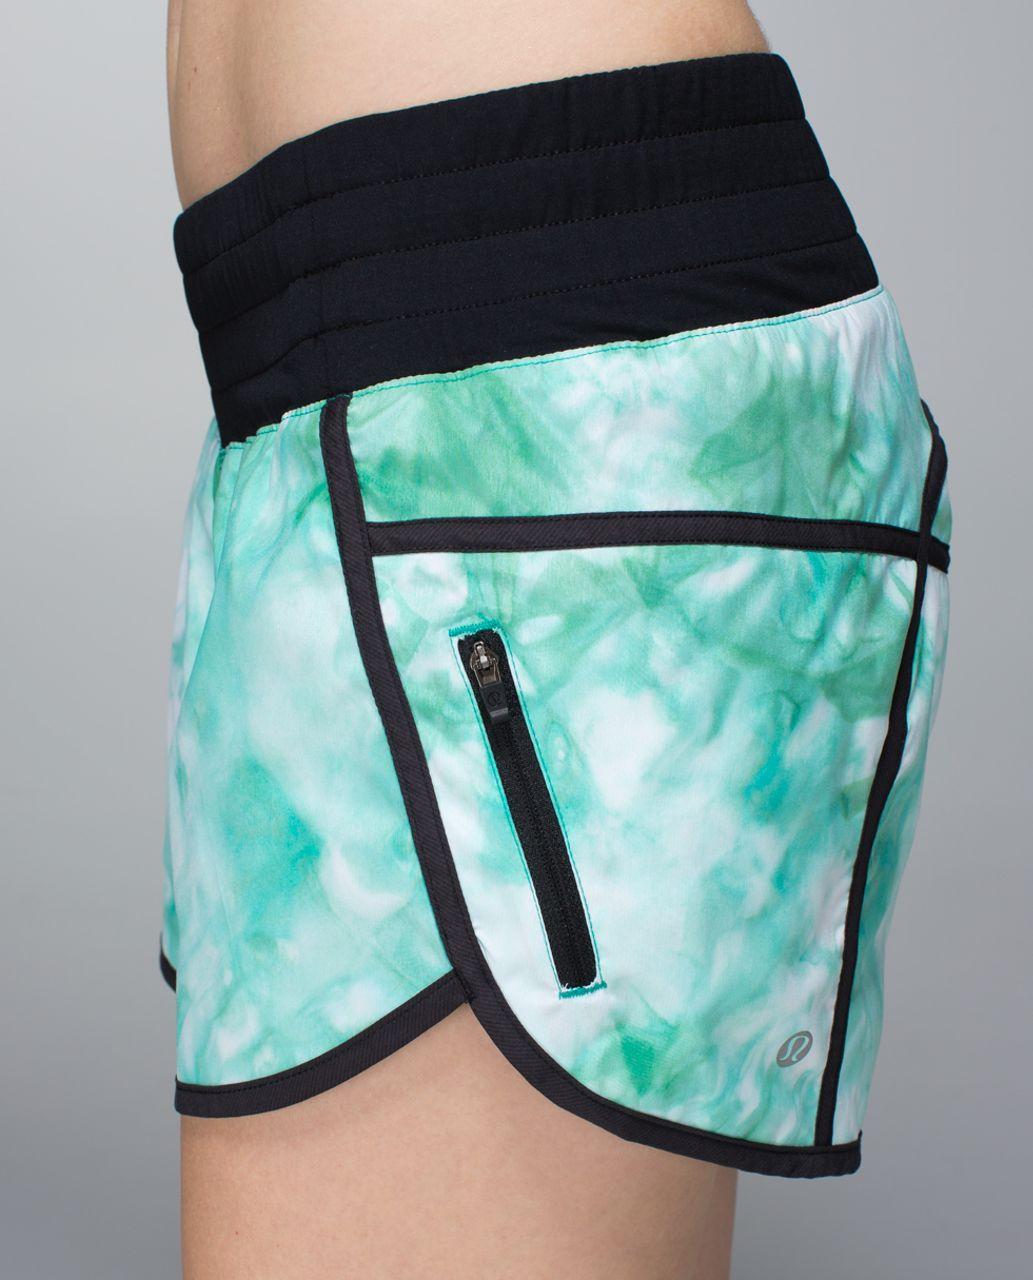 Lululemon Tracker Short II *2-way Stretch - Spray Dye White Blue Tropics / Black